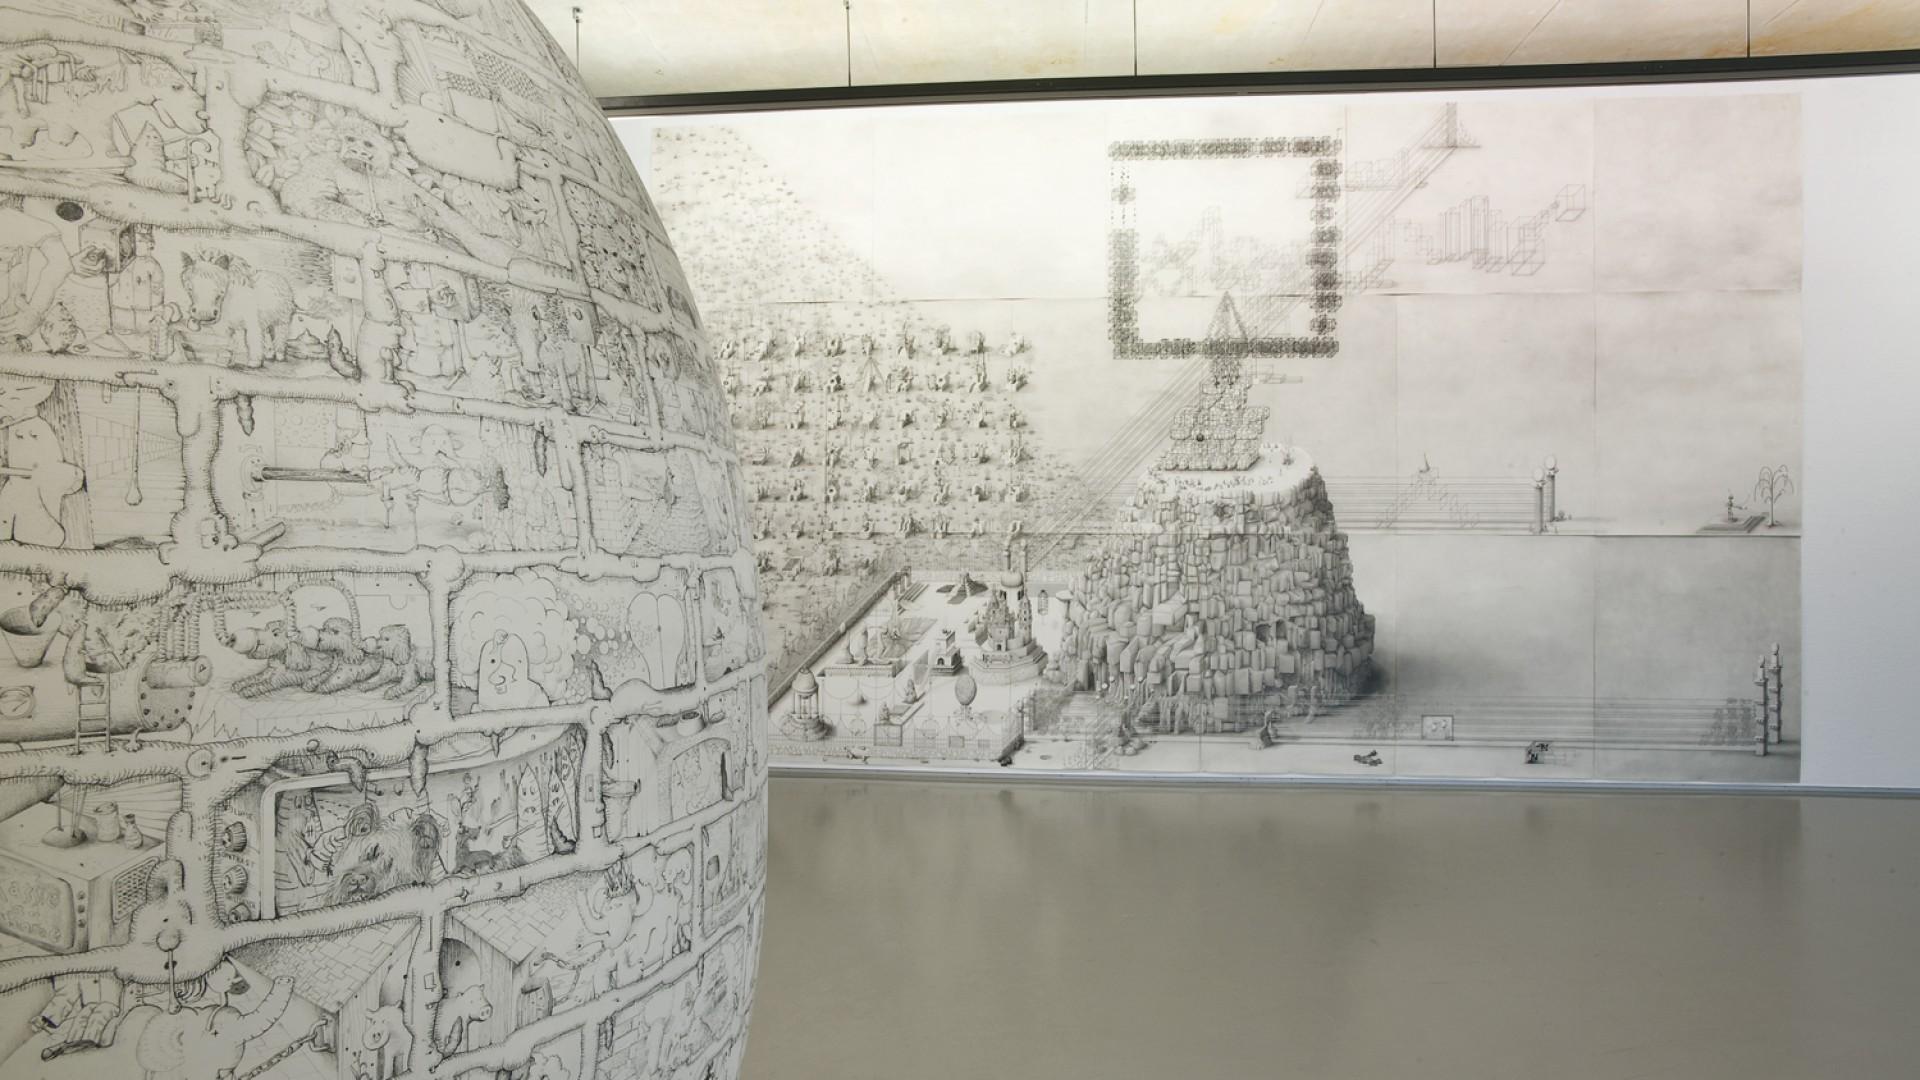 Hedendaagse tekenkunst aanwinstenpresentatie museum boijmans van